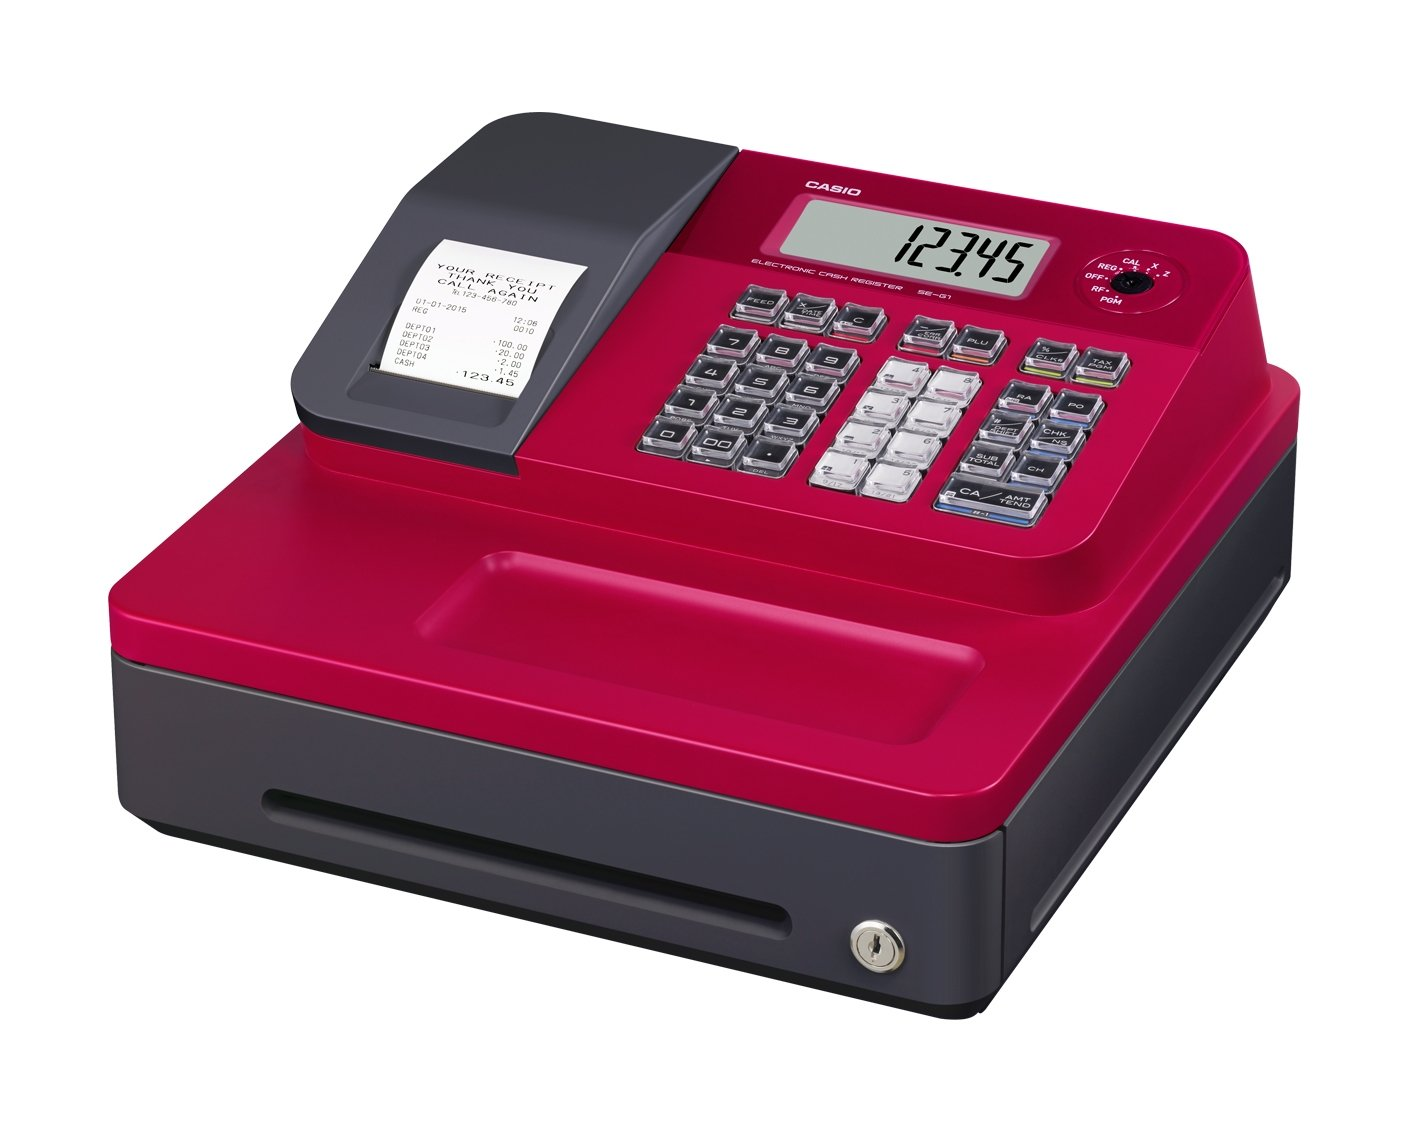 Casio SE G1SC RD Electronic Cash Register